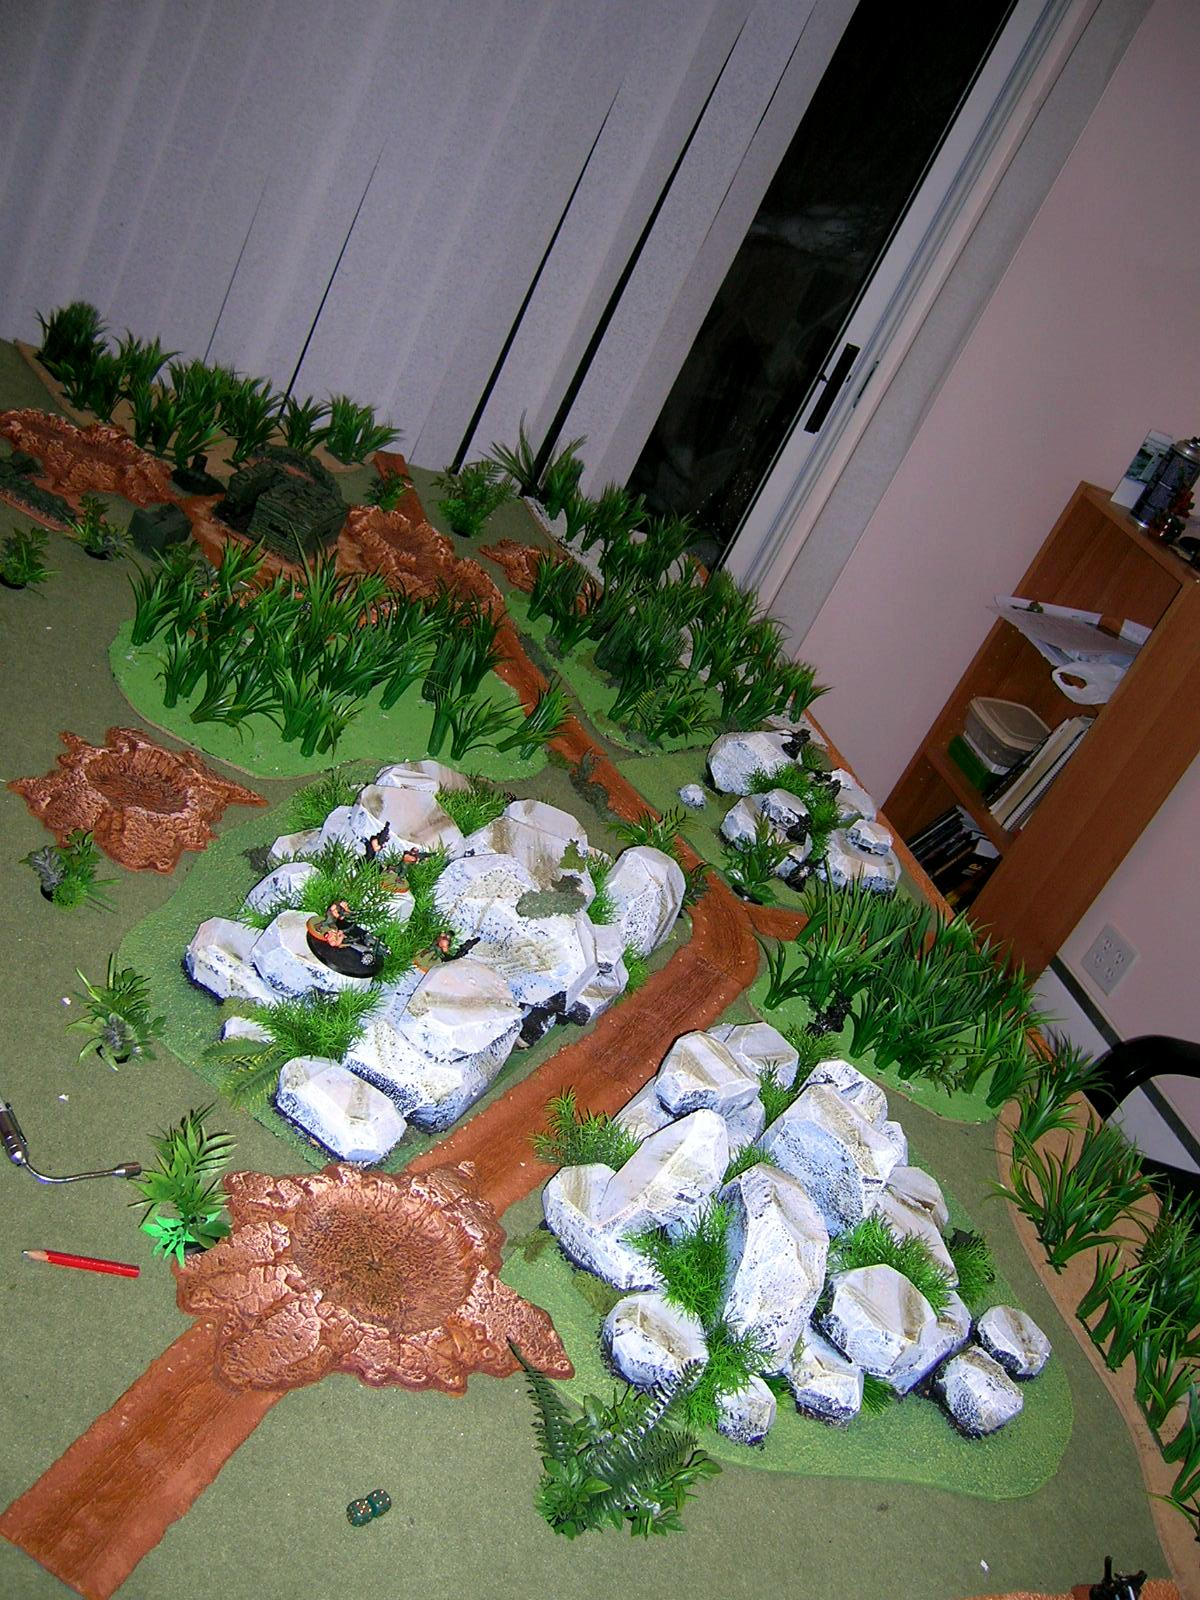 Catachan, Game Table, Jungle, Jungle Terrain